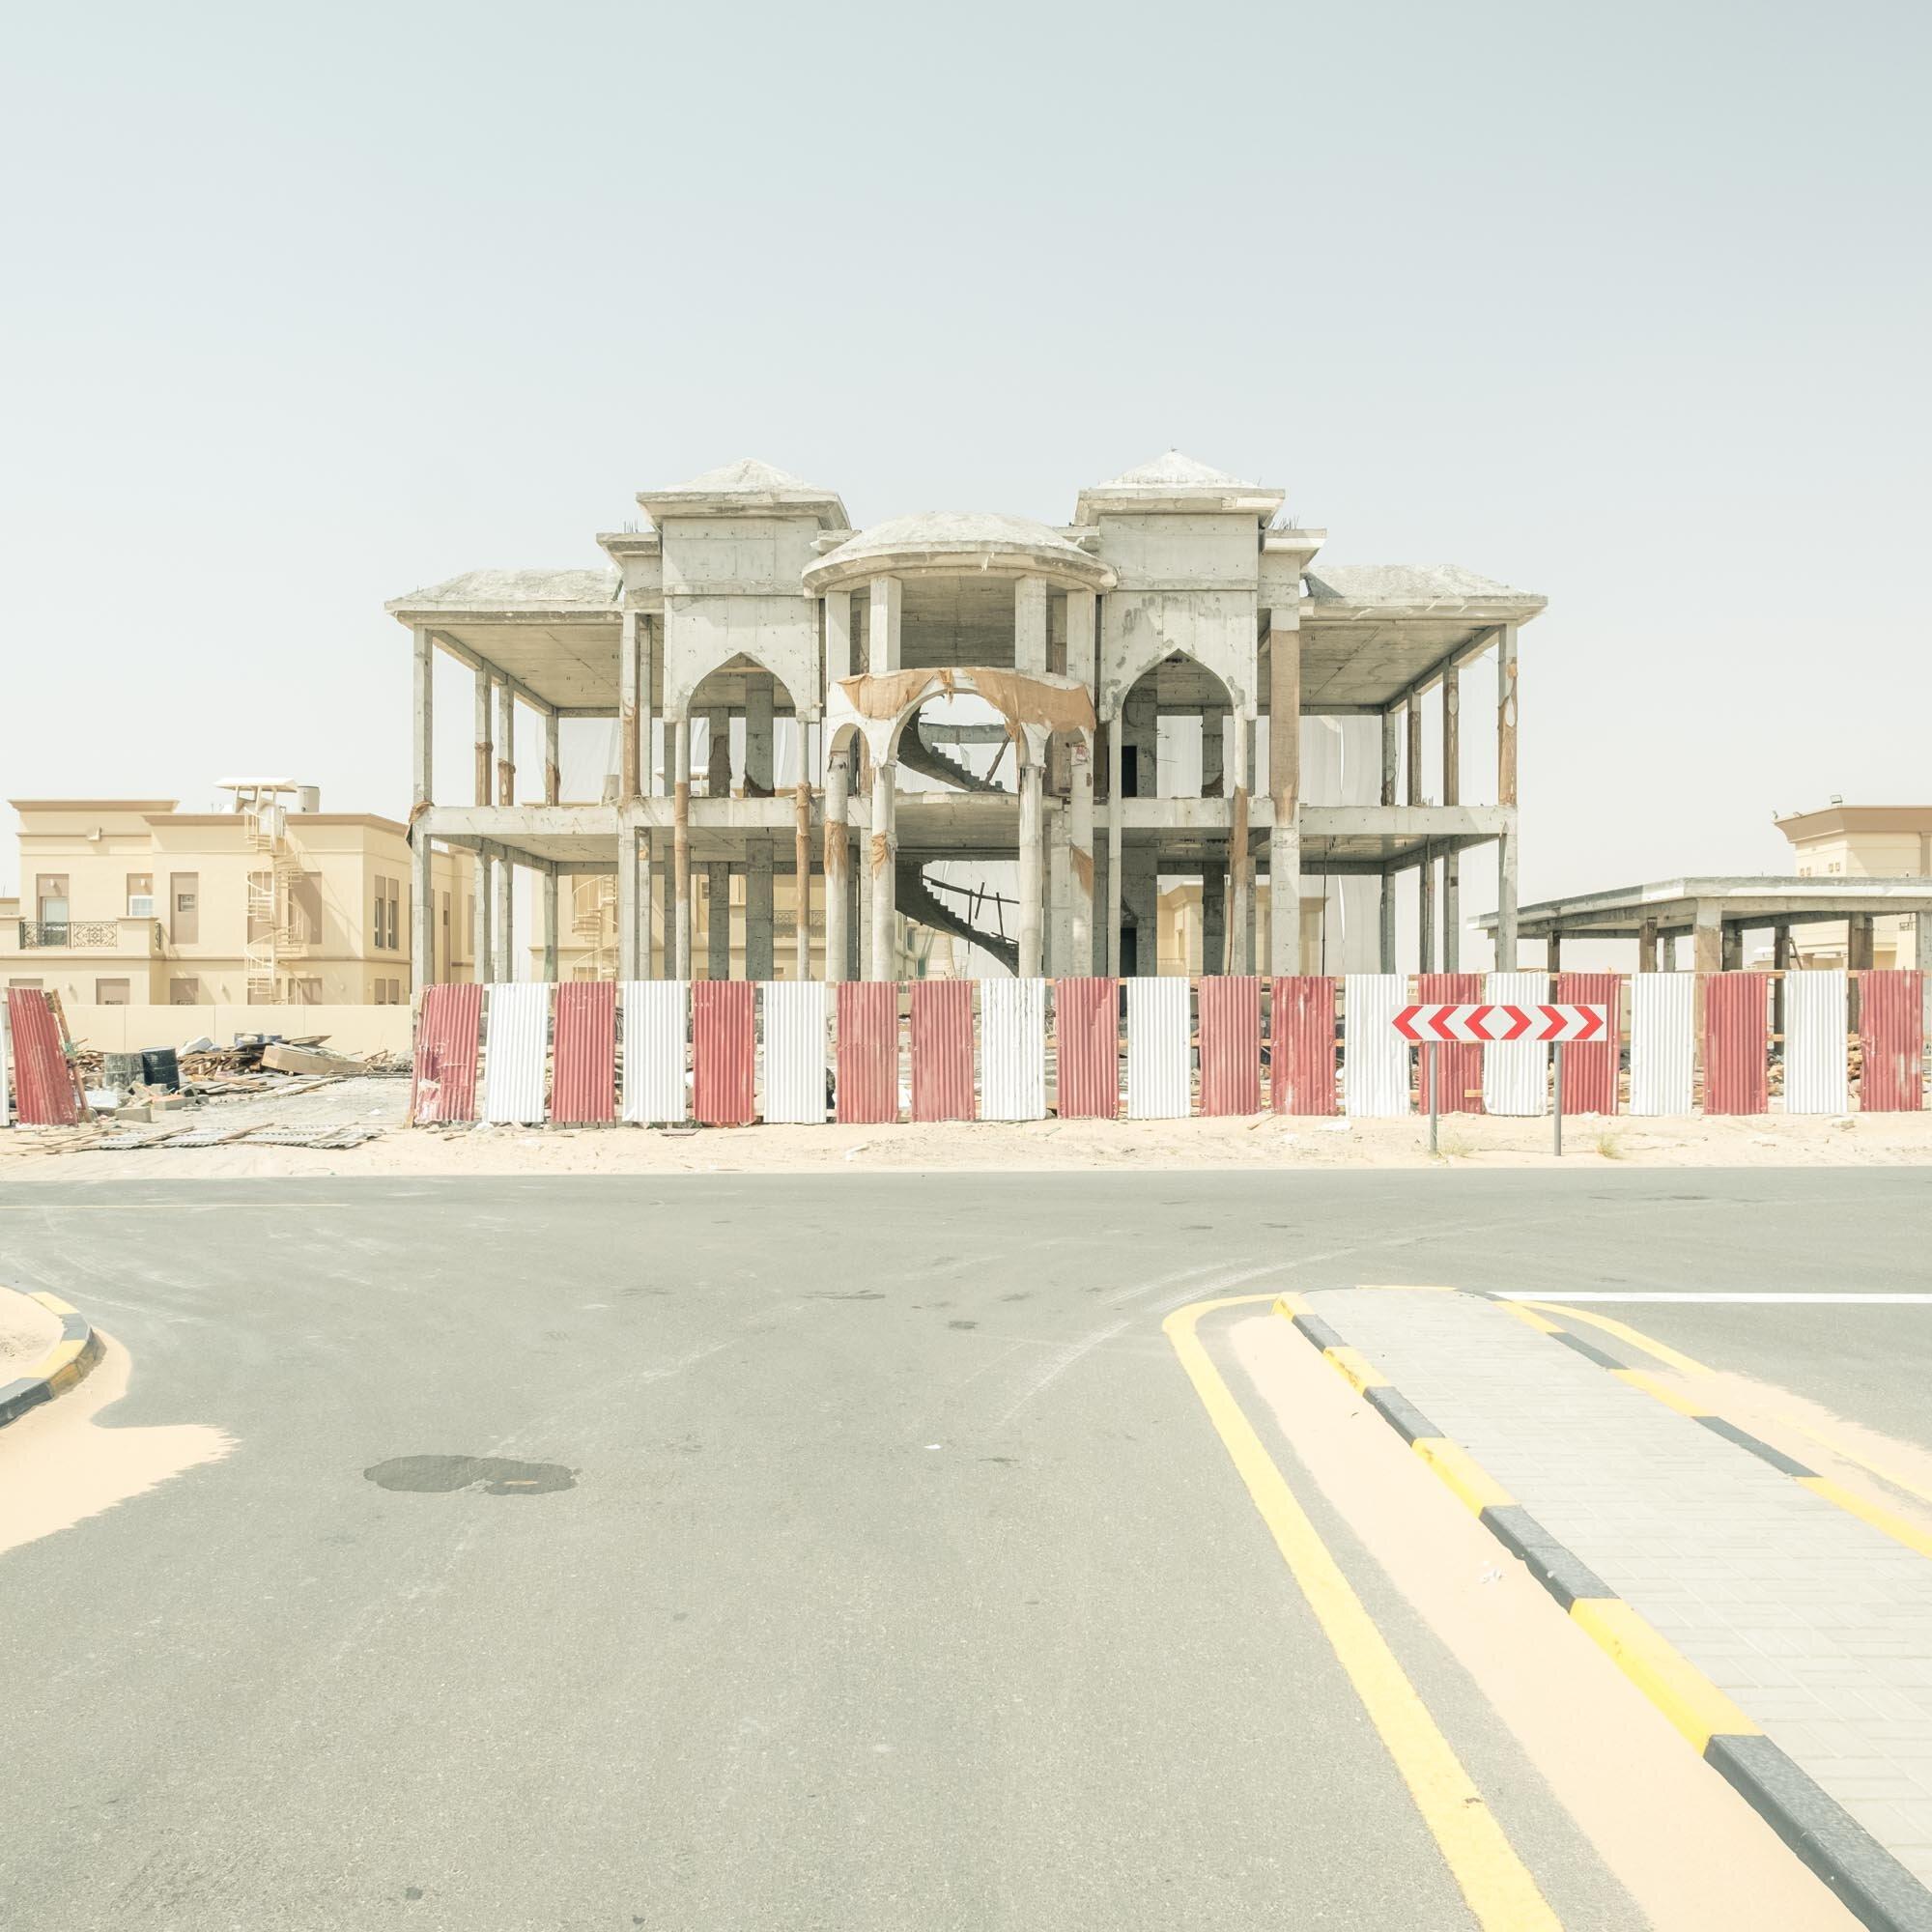 Loic_Vendrame_UAE_04.jpg